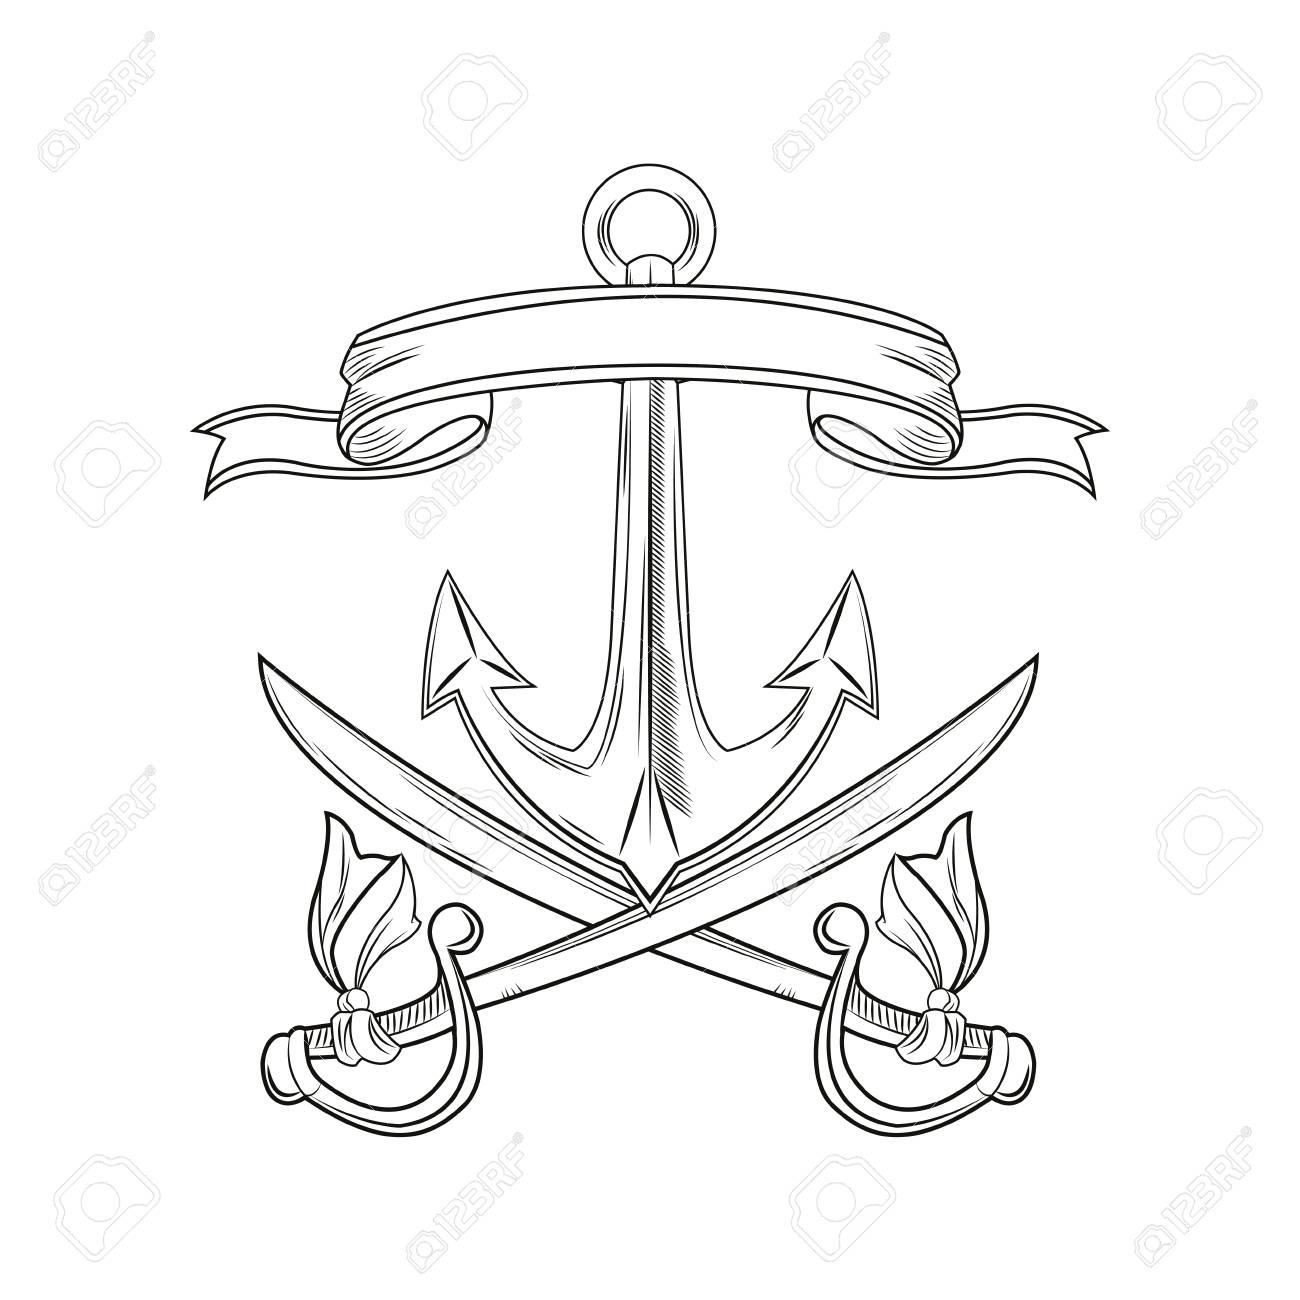 Ancla Espada Cinta Dibujos Animados Pirata Tatuaje Marino Icono ...